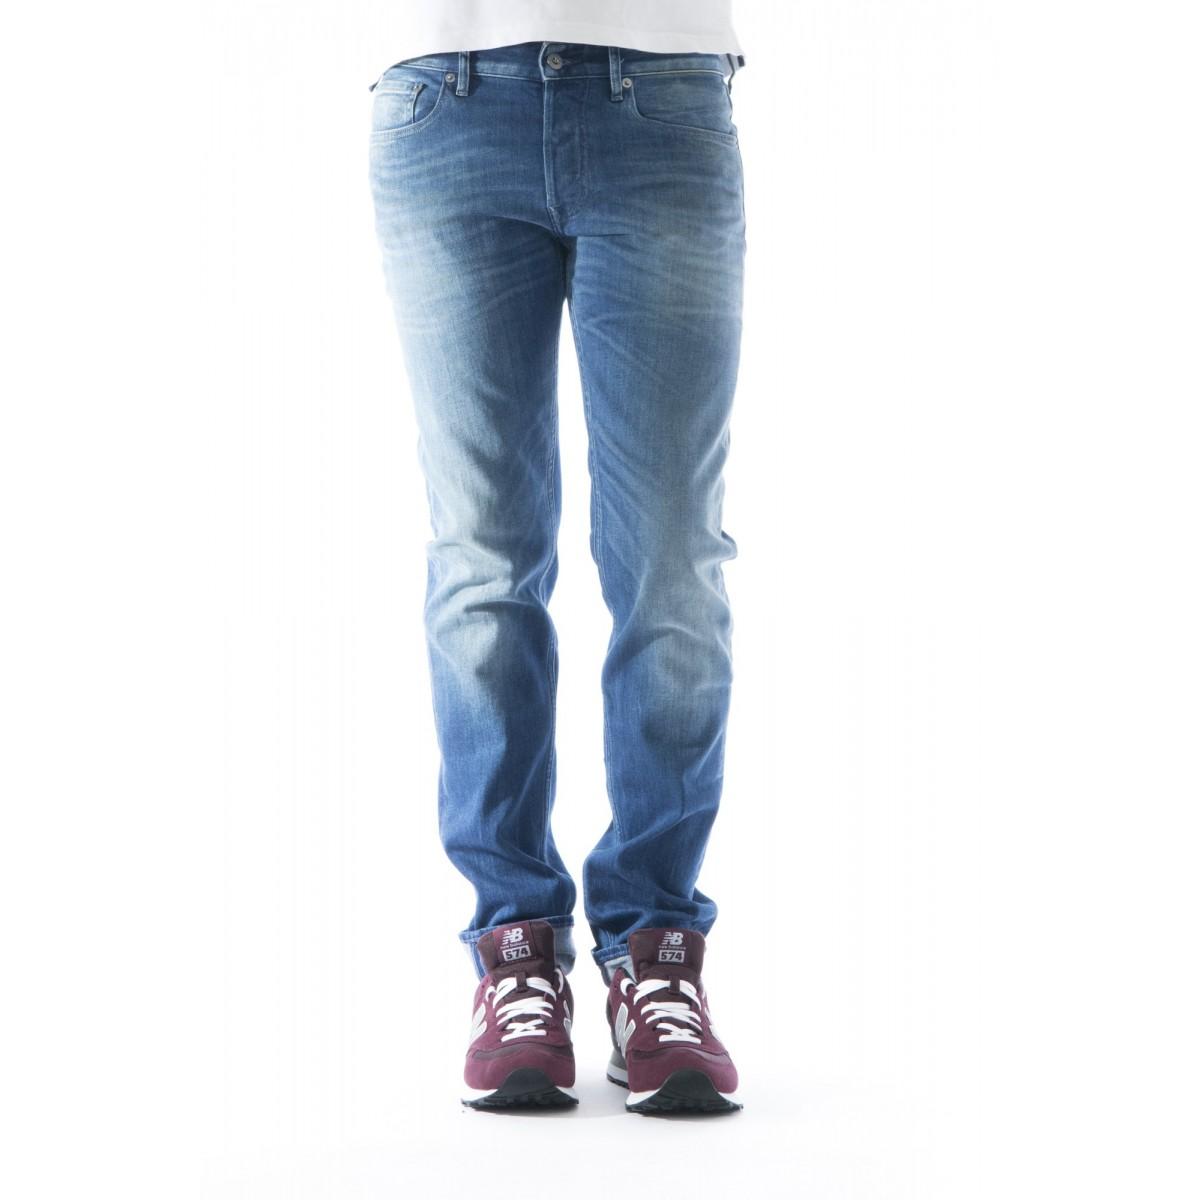 Jeans - J1bn4 slim jeans used